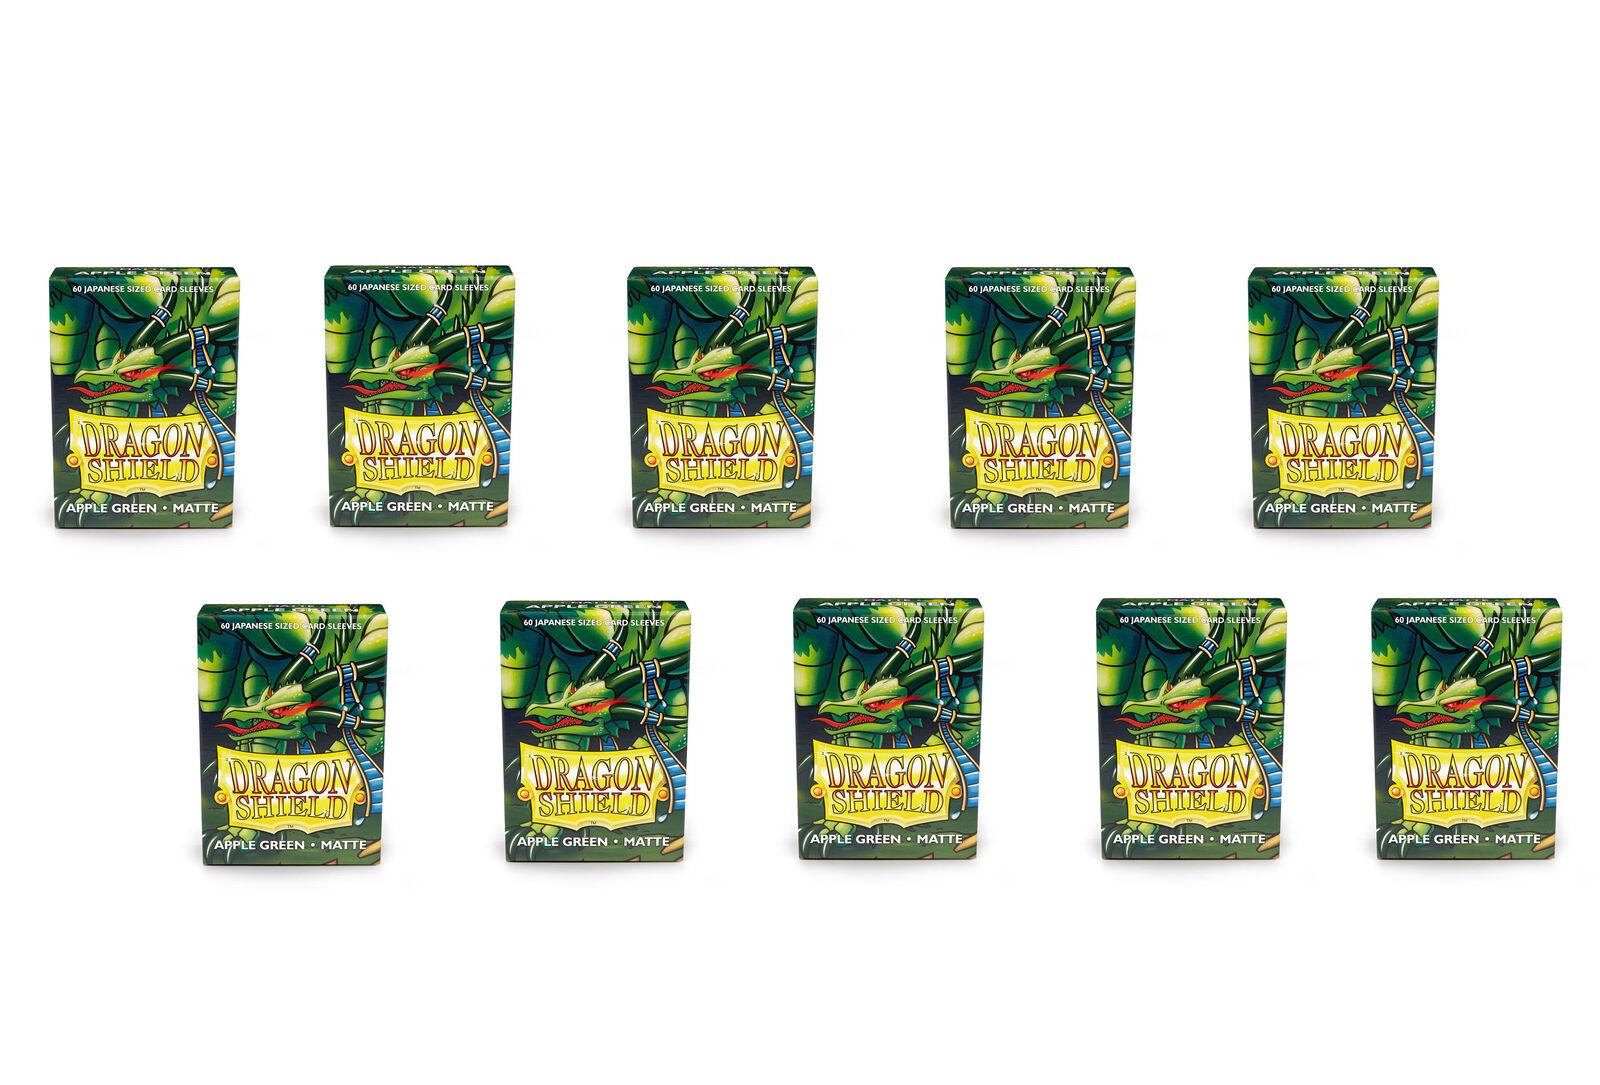 10 Packs Dragon Shield Matte Mini Japanese Apple Green 60 ct Card Sleeves Display Case